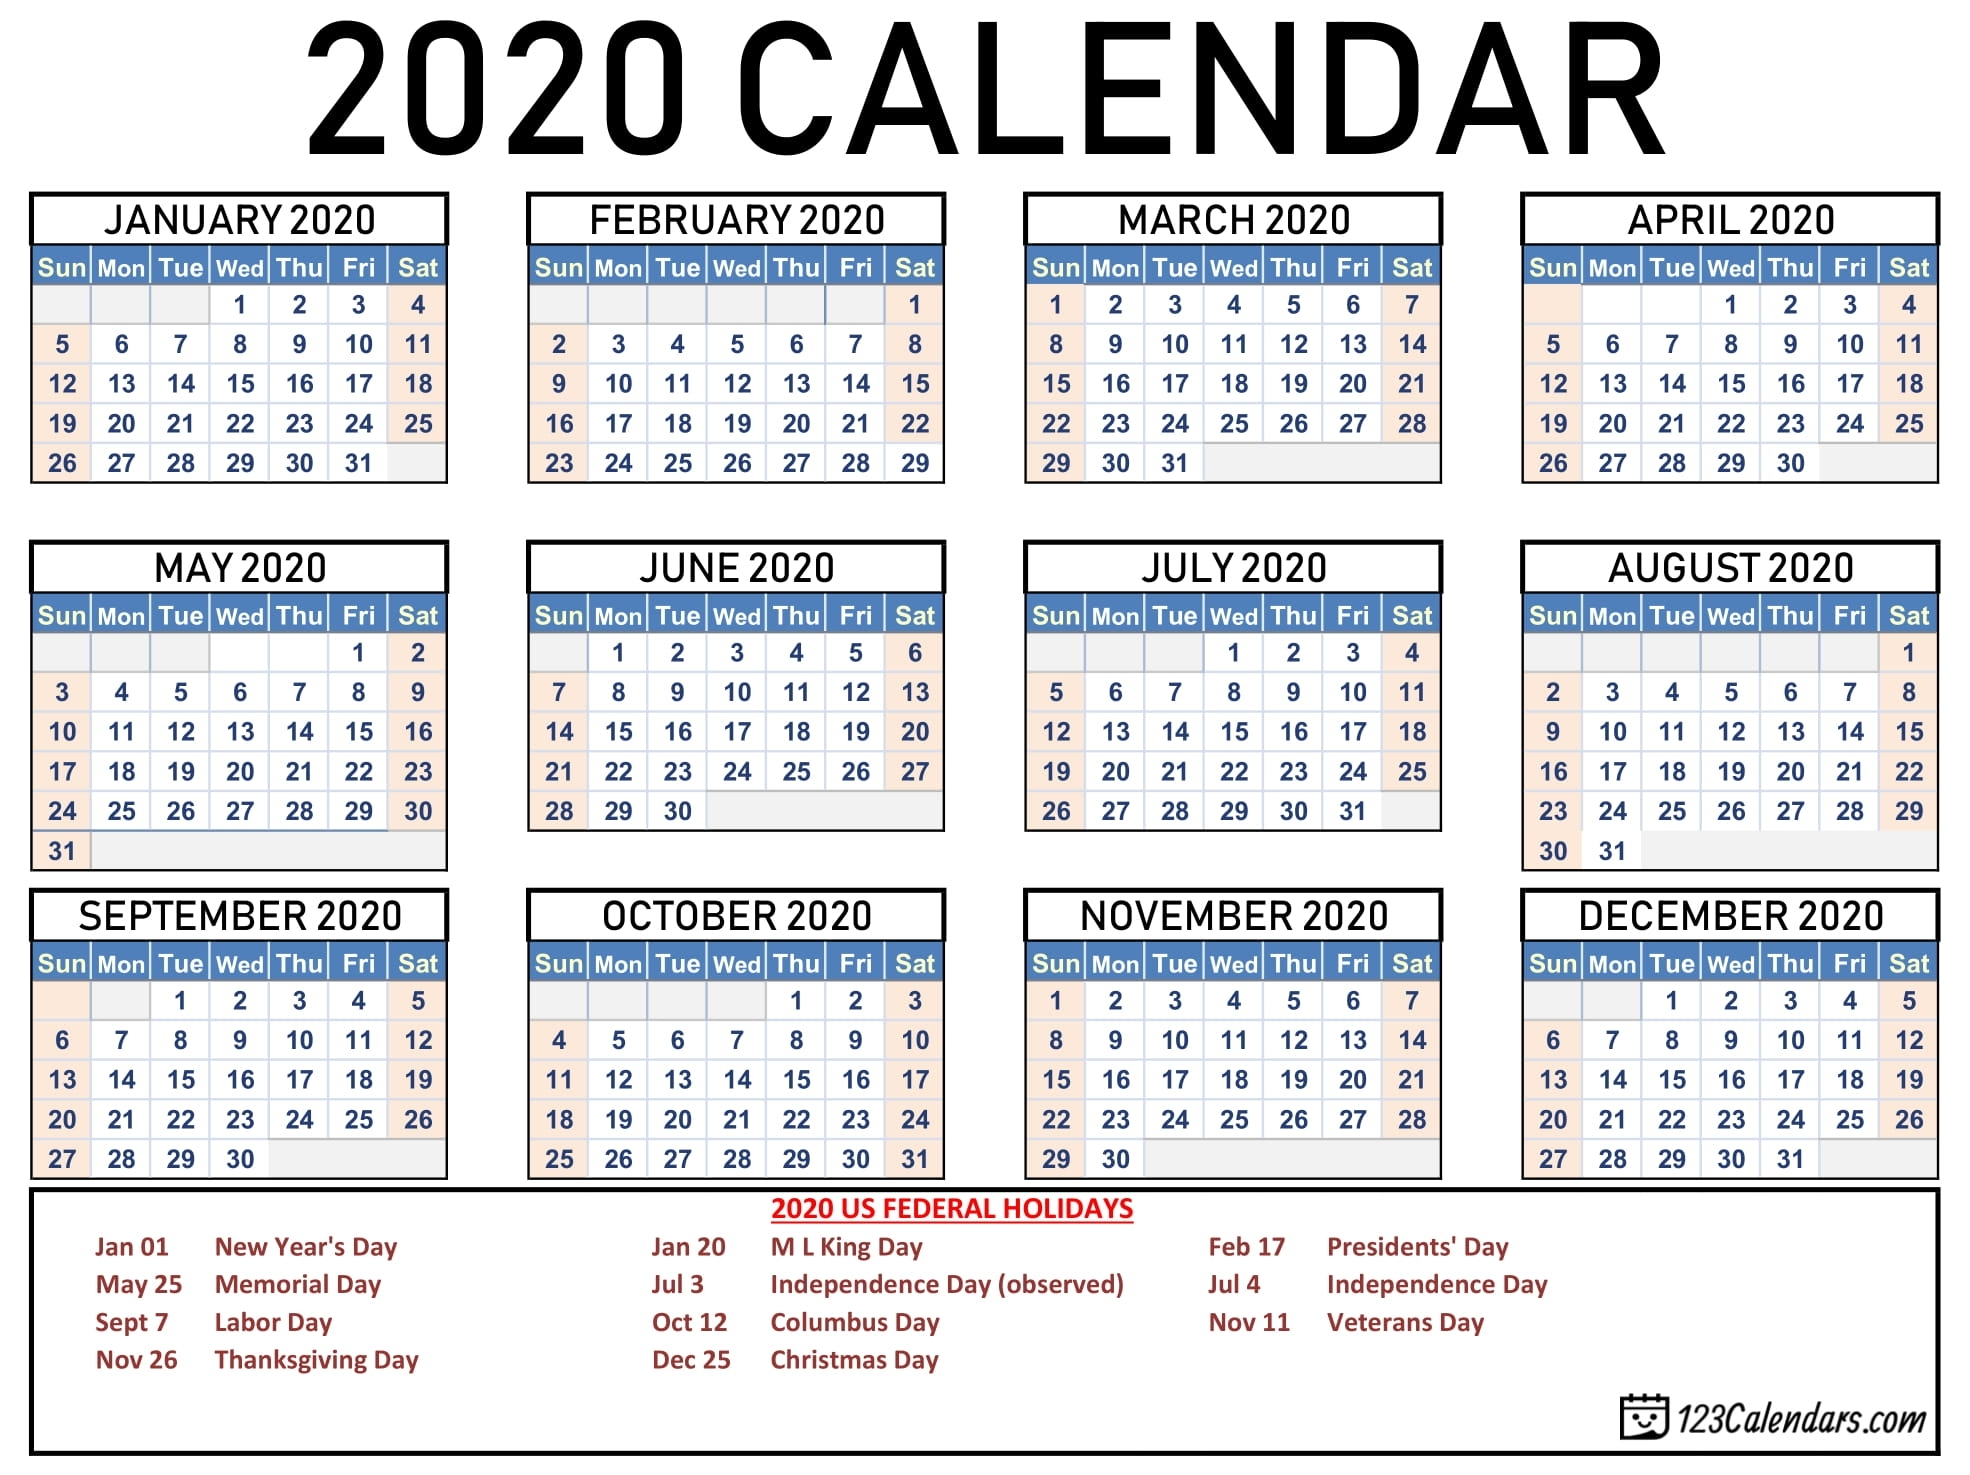 Free Printable 2020 Calendar | 123Calendars within Free Printable Pocket Calendar 2020